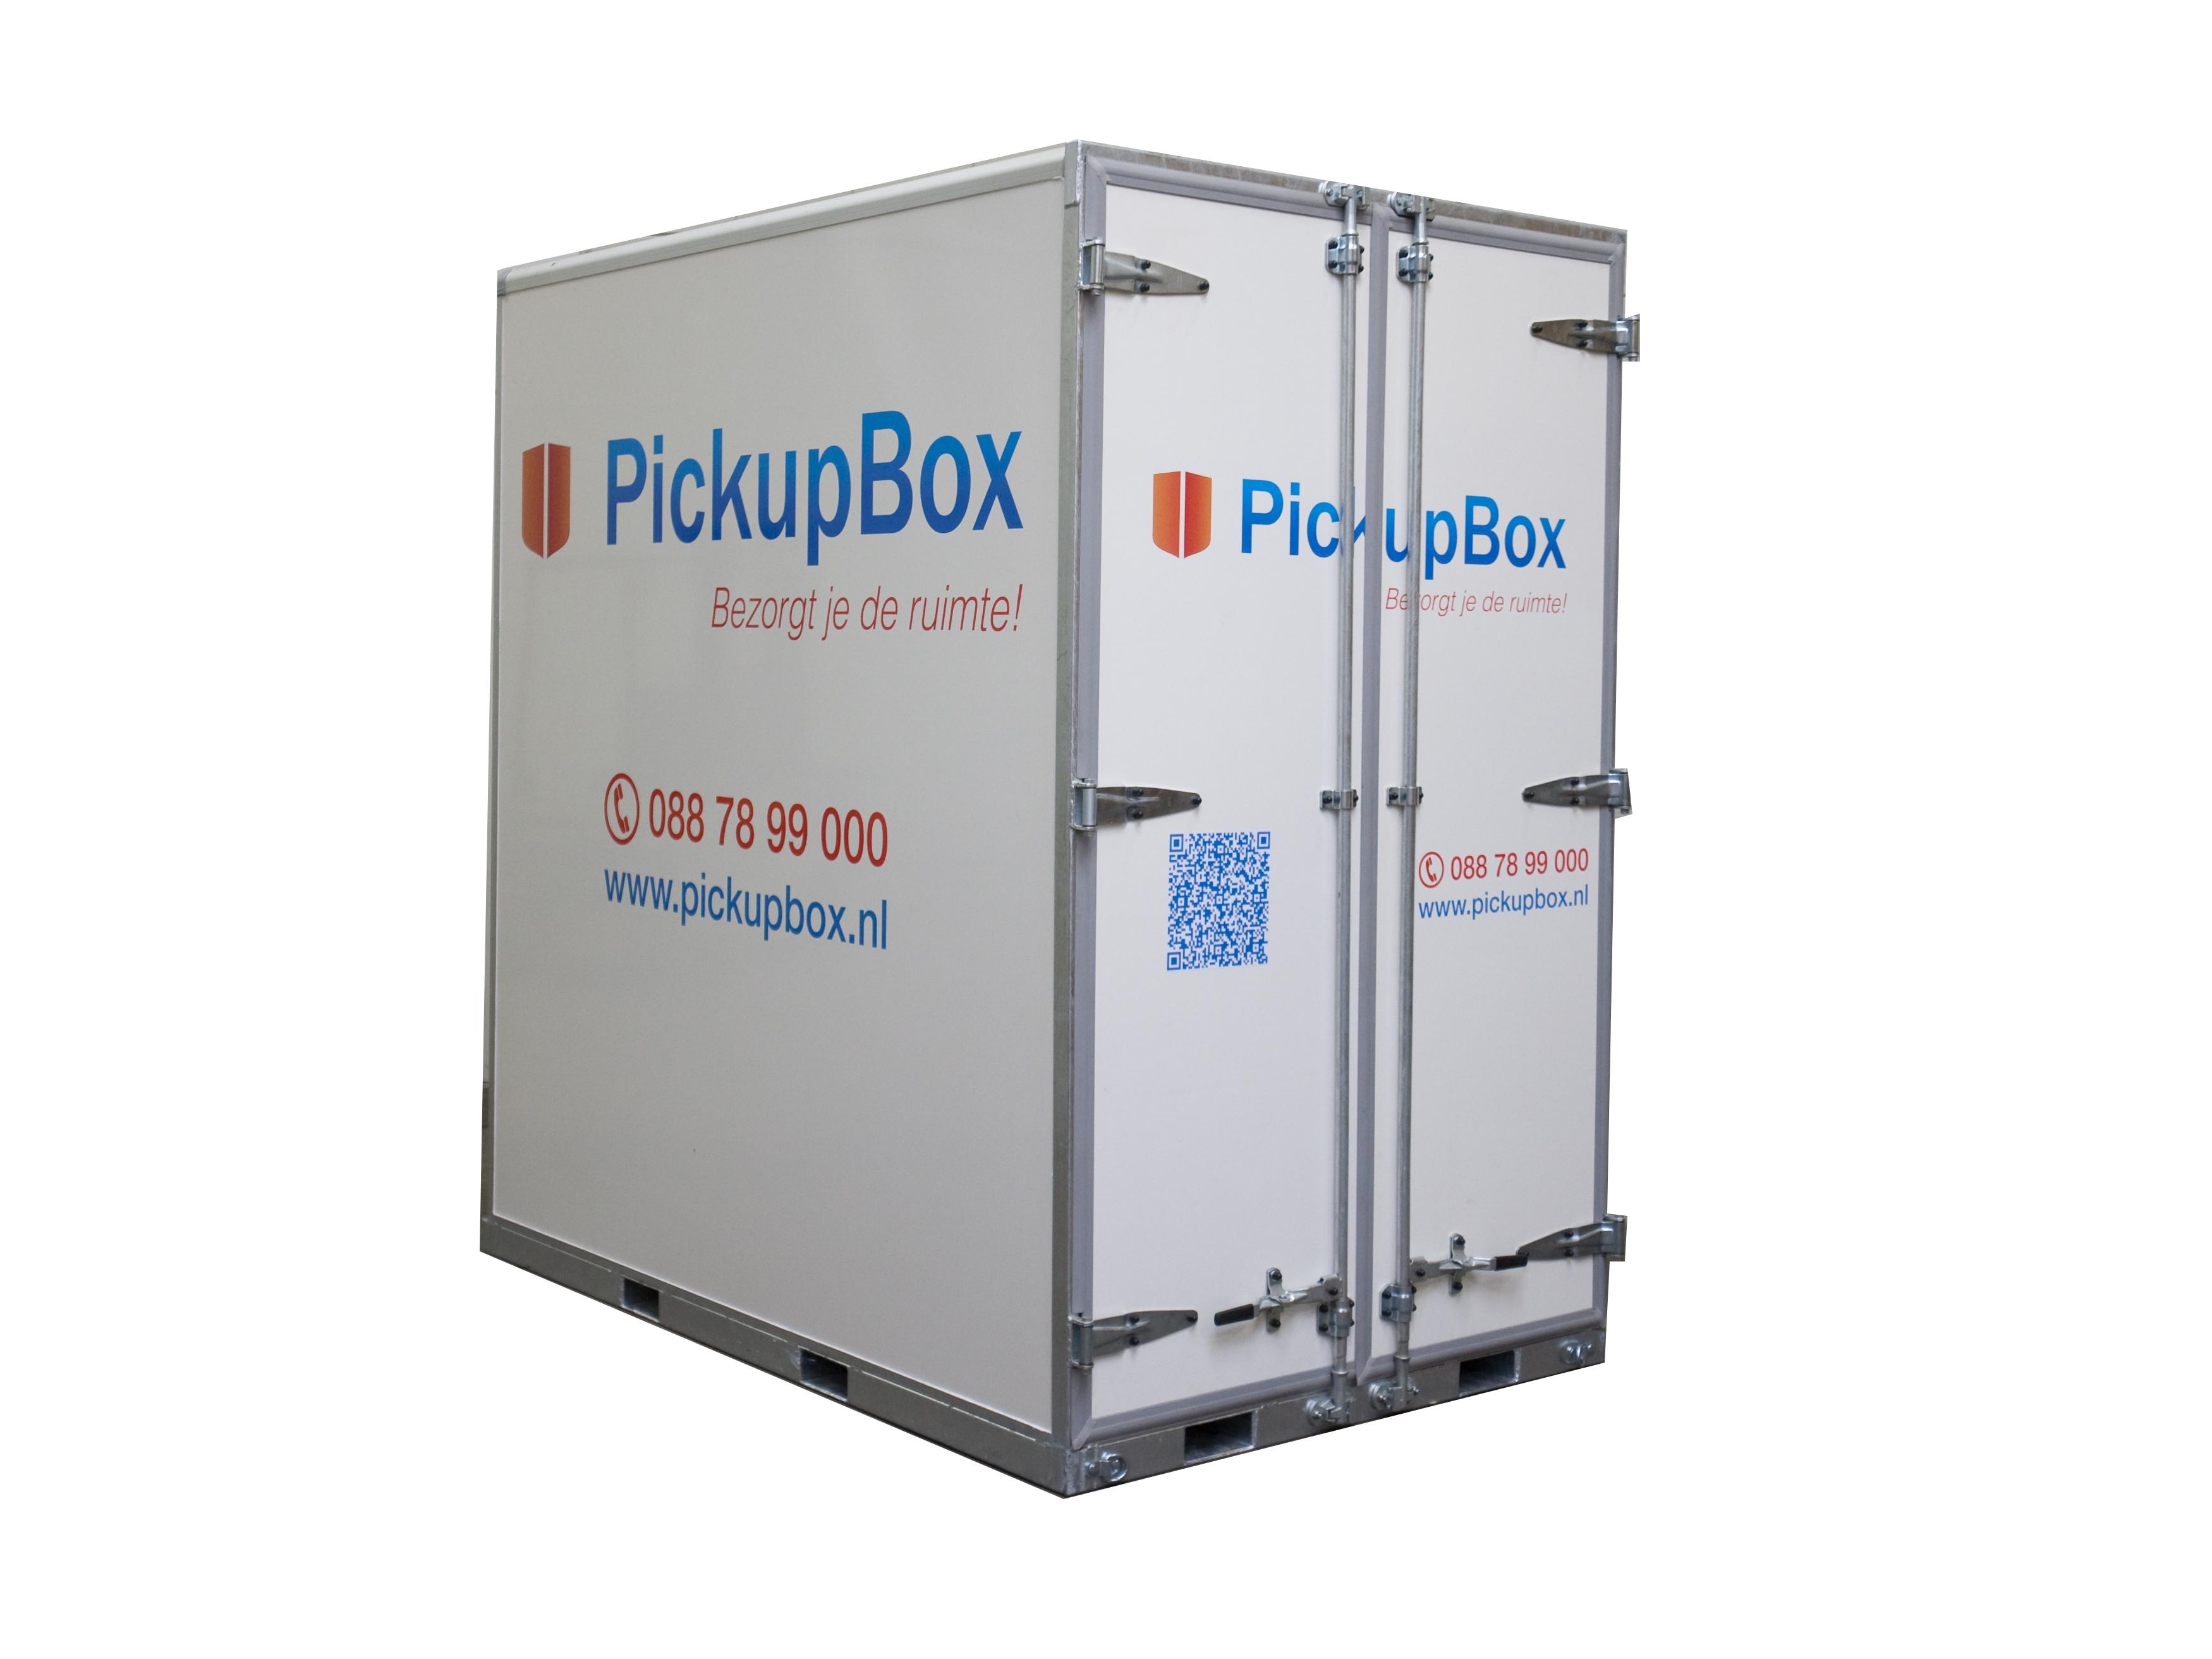 PickupBox